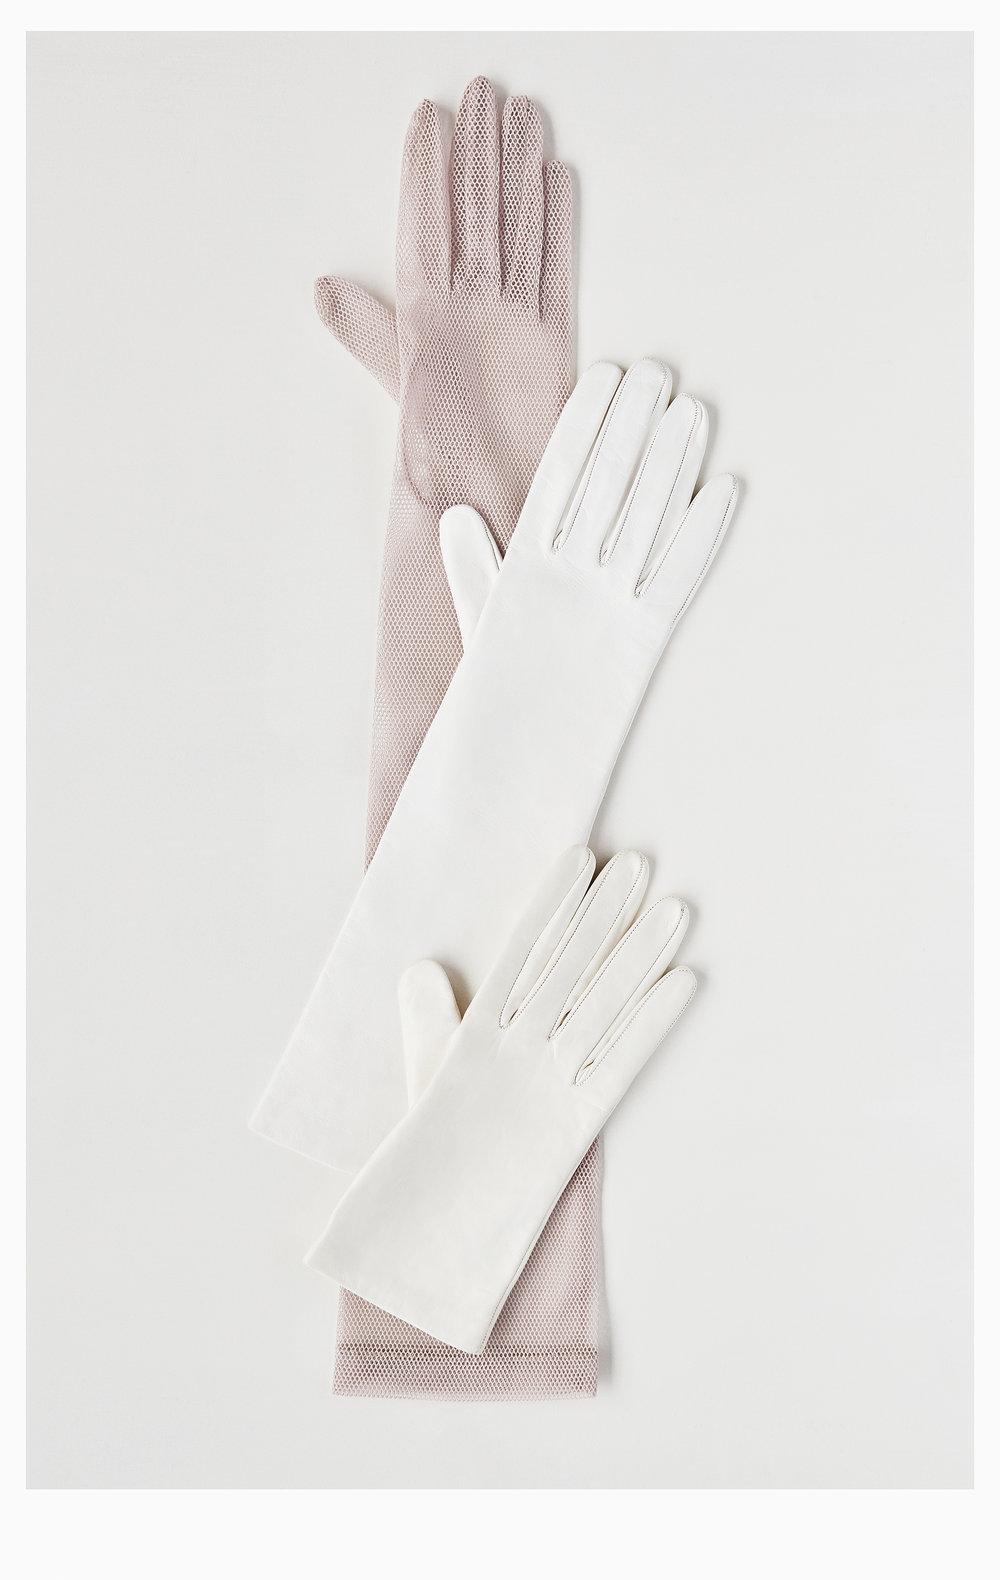 ATARAH_181007_Gloves_White_113_RT_Web.jpg